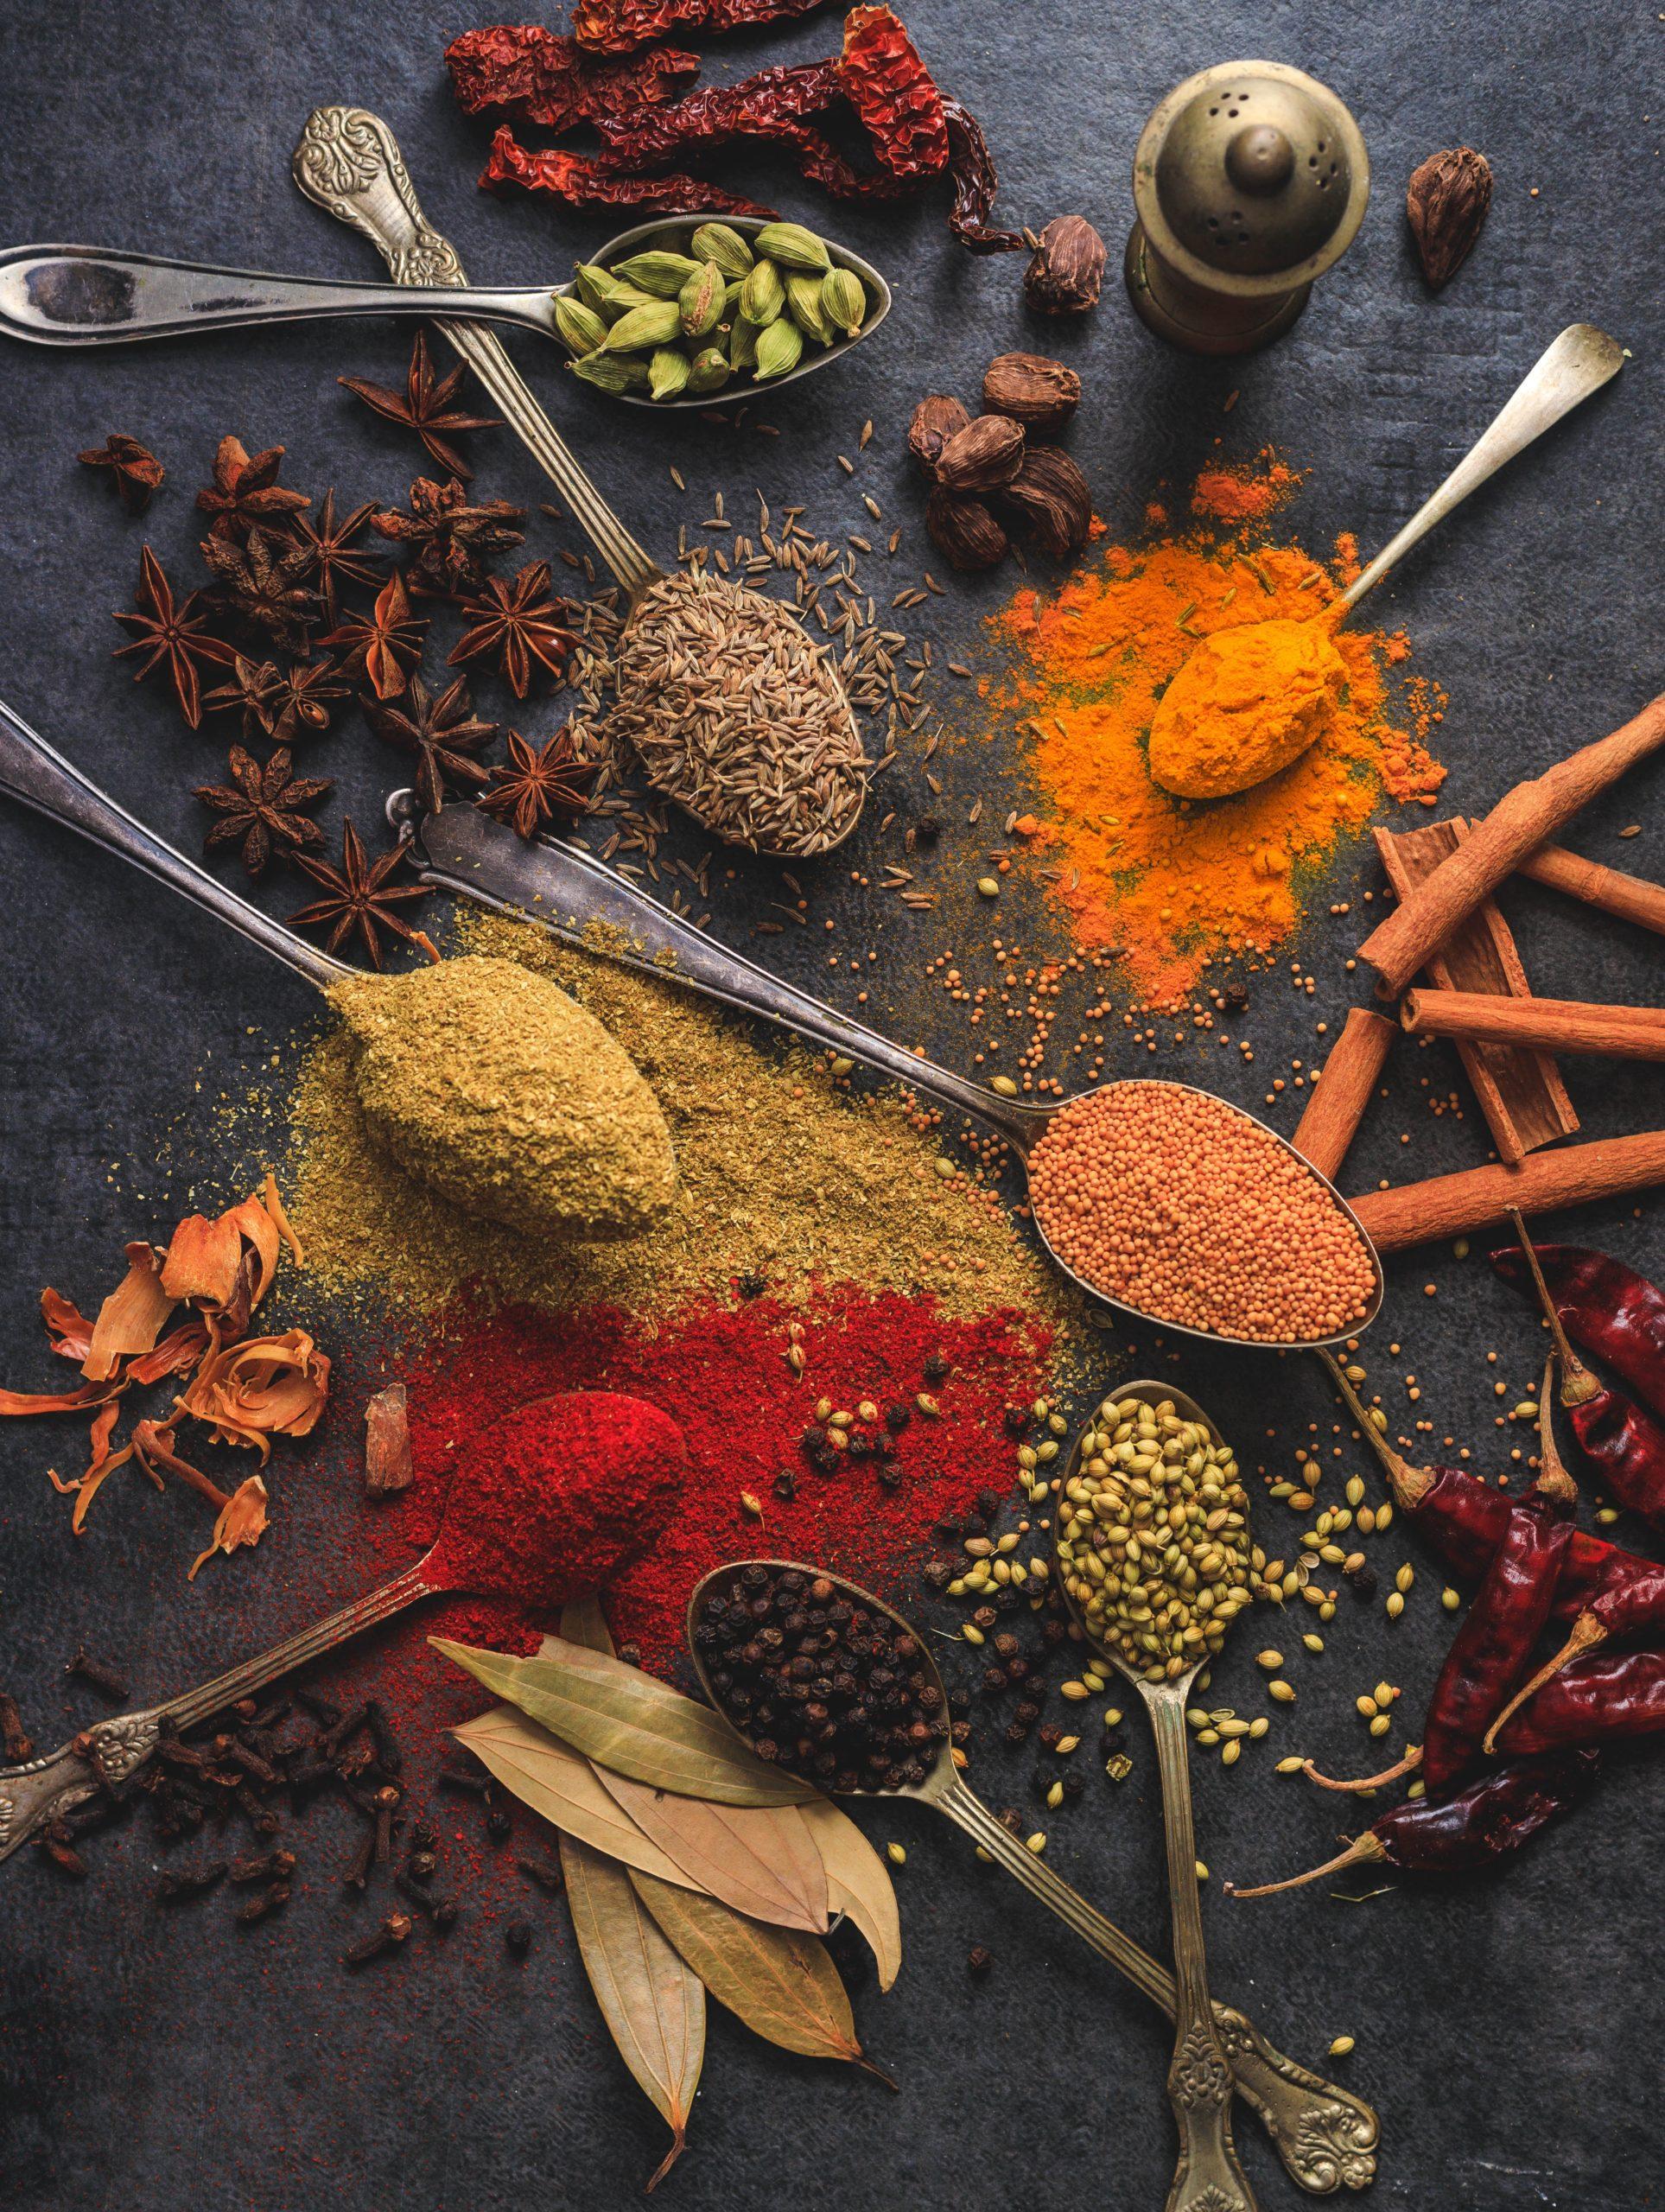 Spice Rubs – wie würzig magst du es?